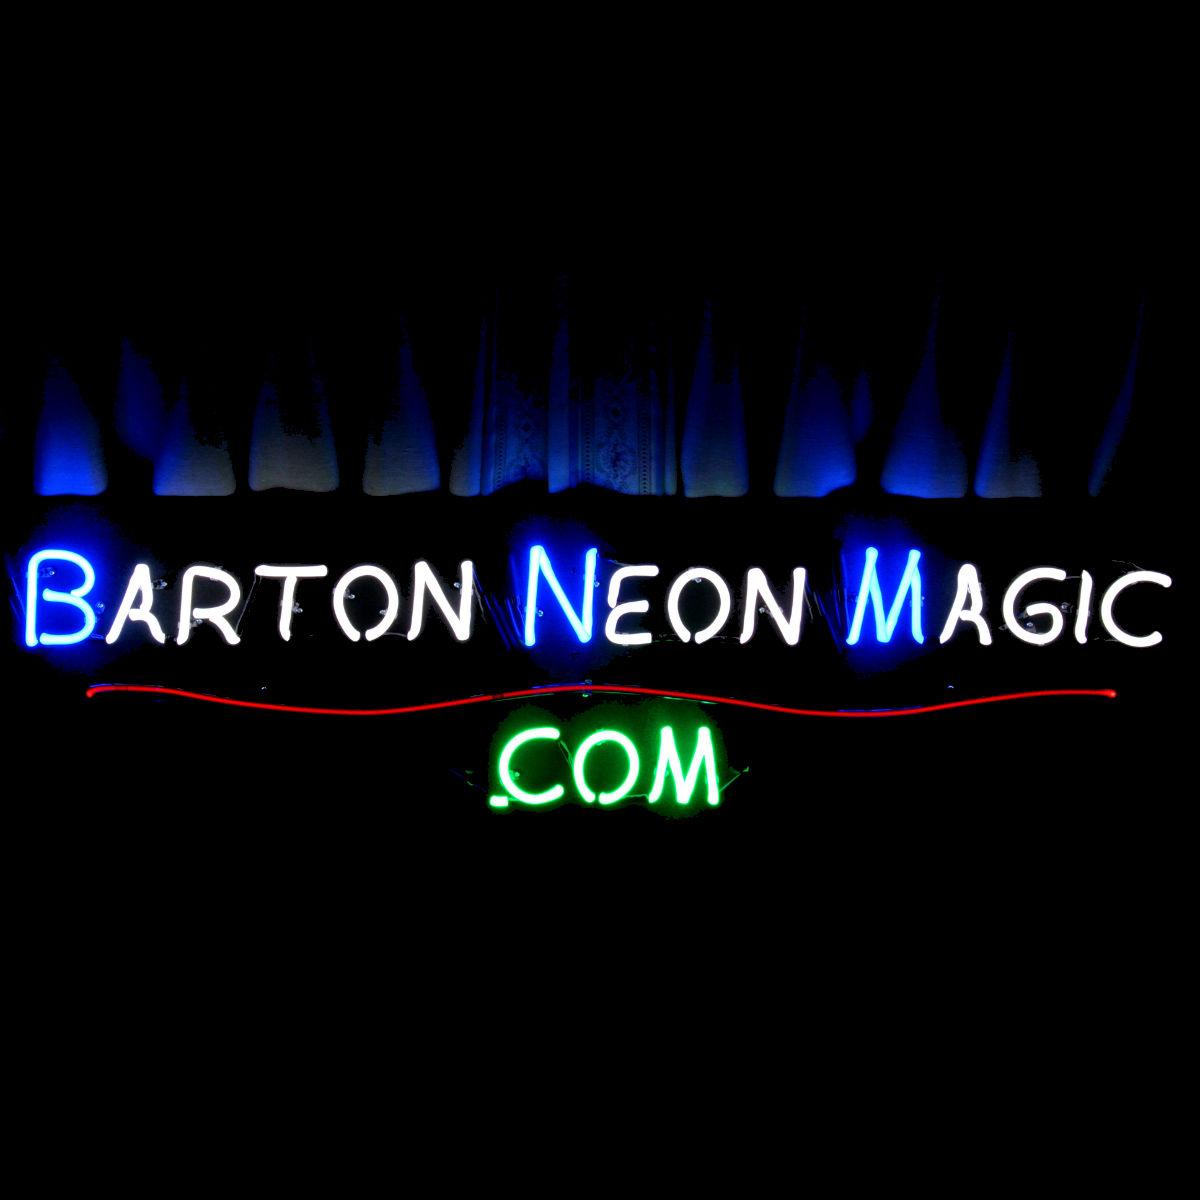 FRENCH PARISIAN NEON LIGHT ARTWORK BY JOHN BARTON - BartonNeonMagic.com